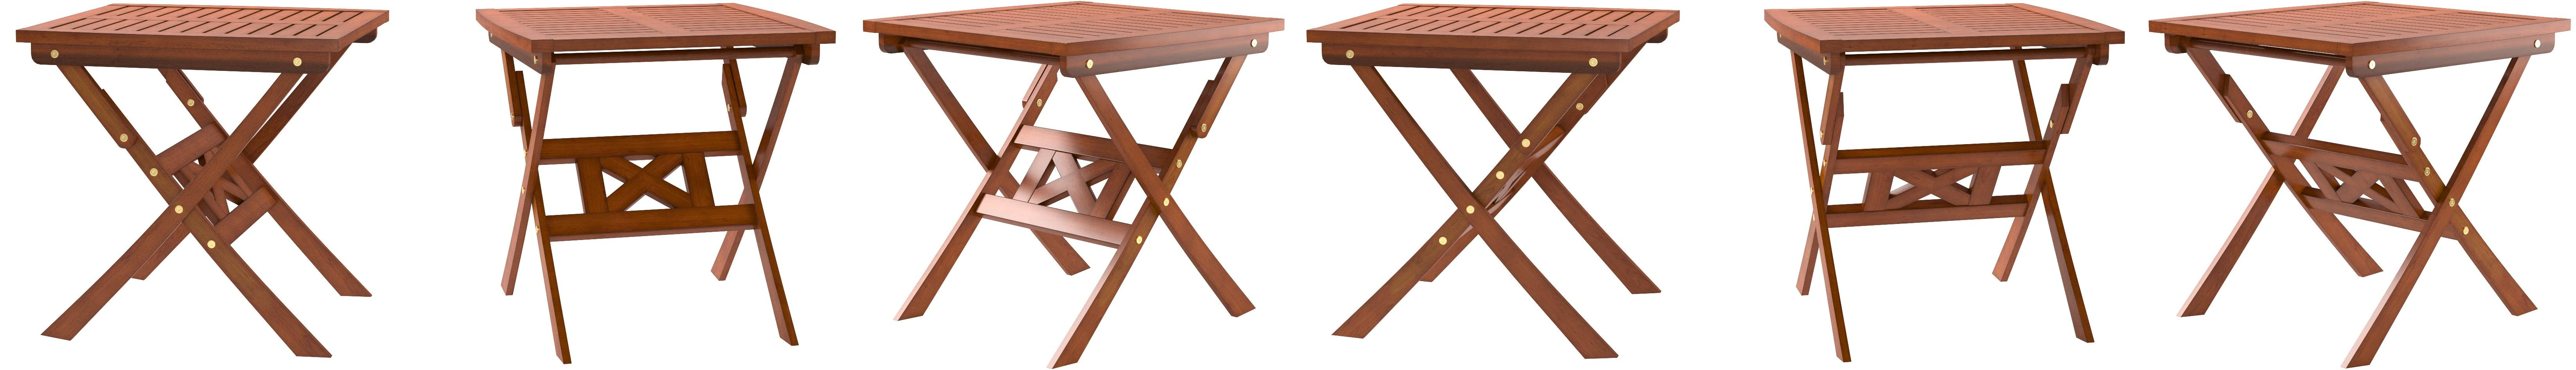 Amazon Com Vifah Malibu Outdoor Folding Bistro Table Garden Outdoor